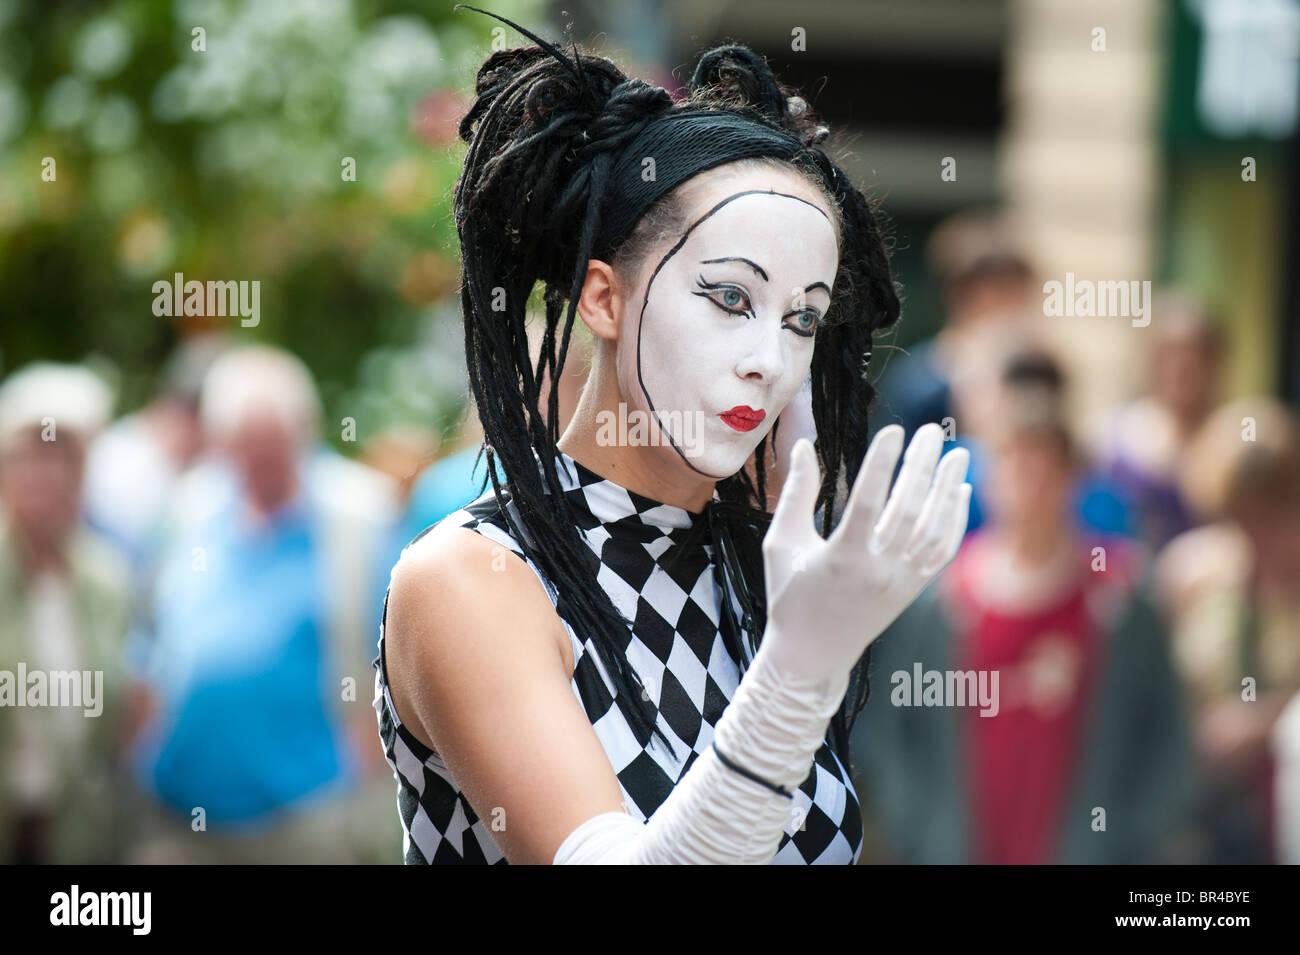 Mime artist at Shrewsbury International Street Theatre Festival Shropshire UK - Stock Image